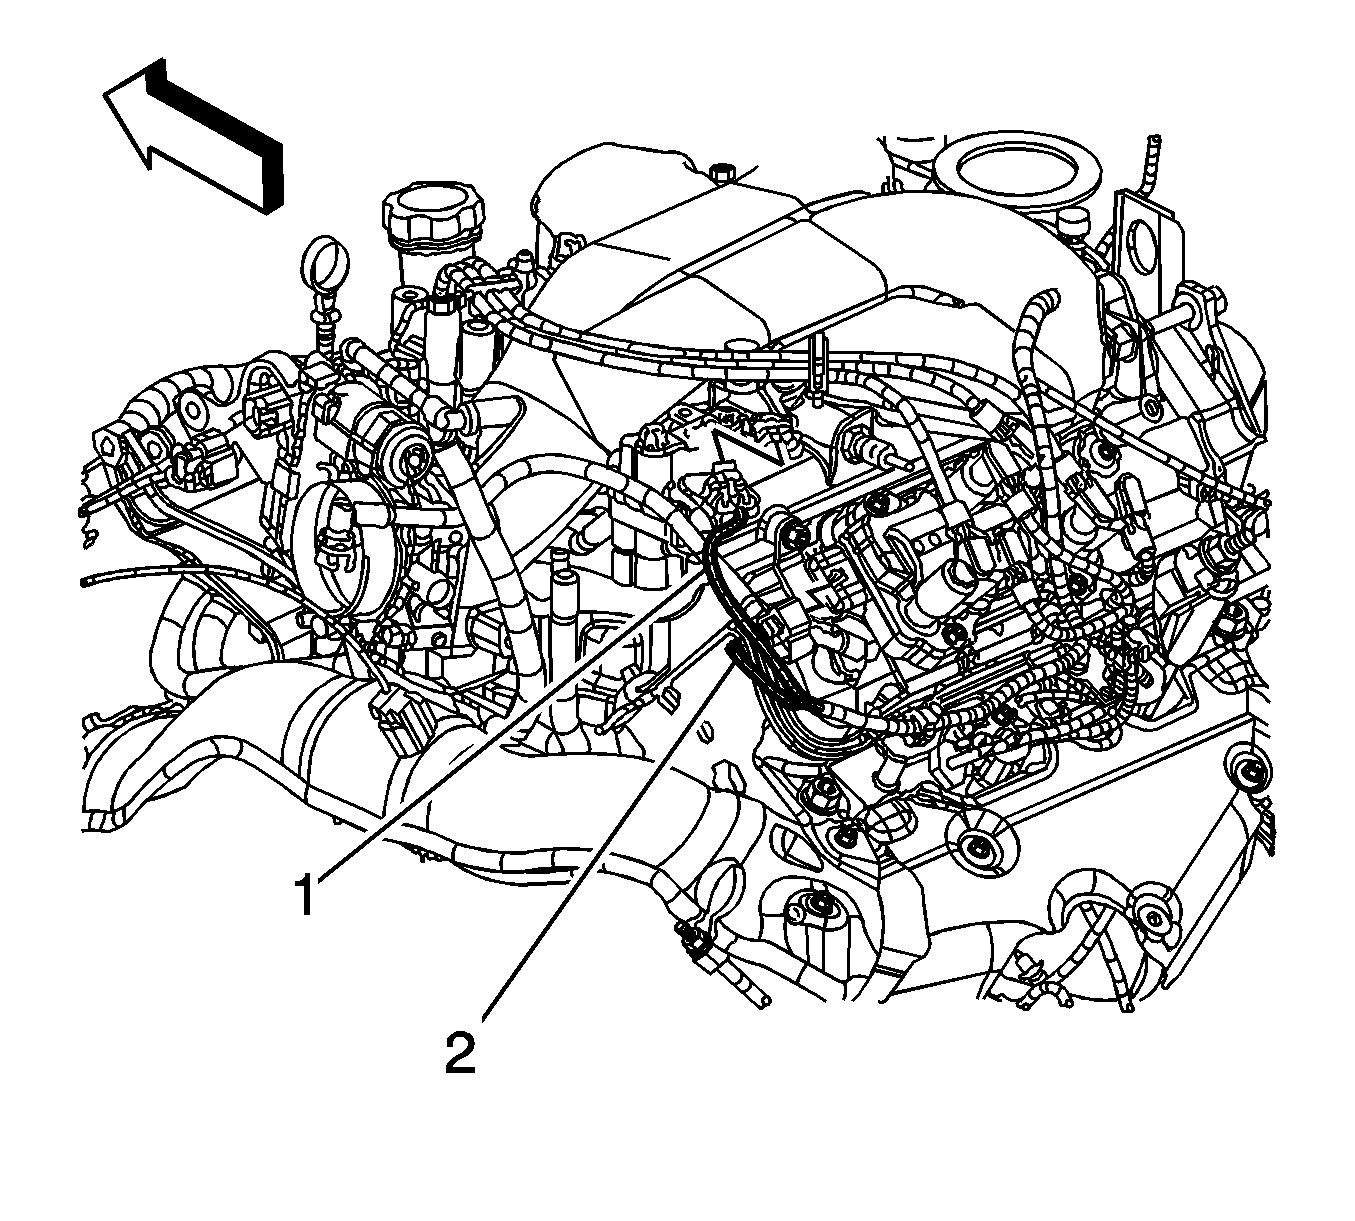 Yh 4859 2006 Buick Terraza Engine Diagram Wiring Diagram